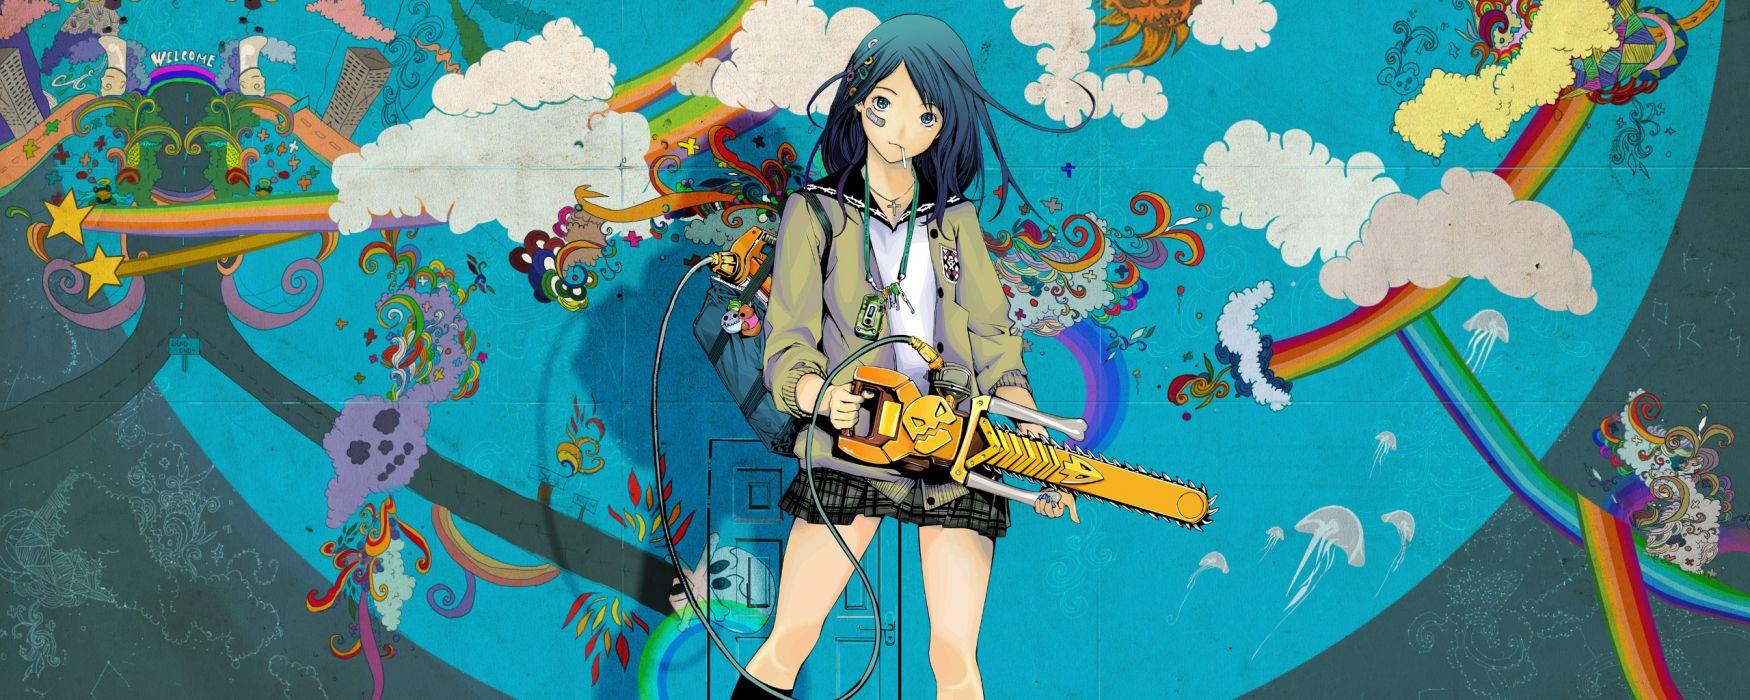 Air Gear anime anime girls wallpaper